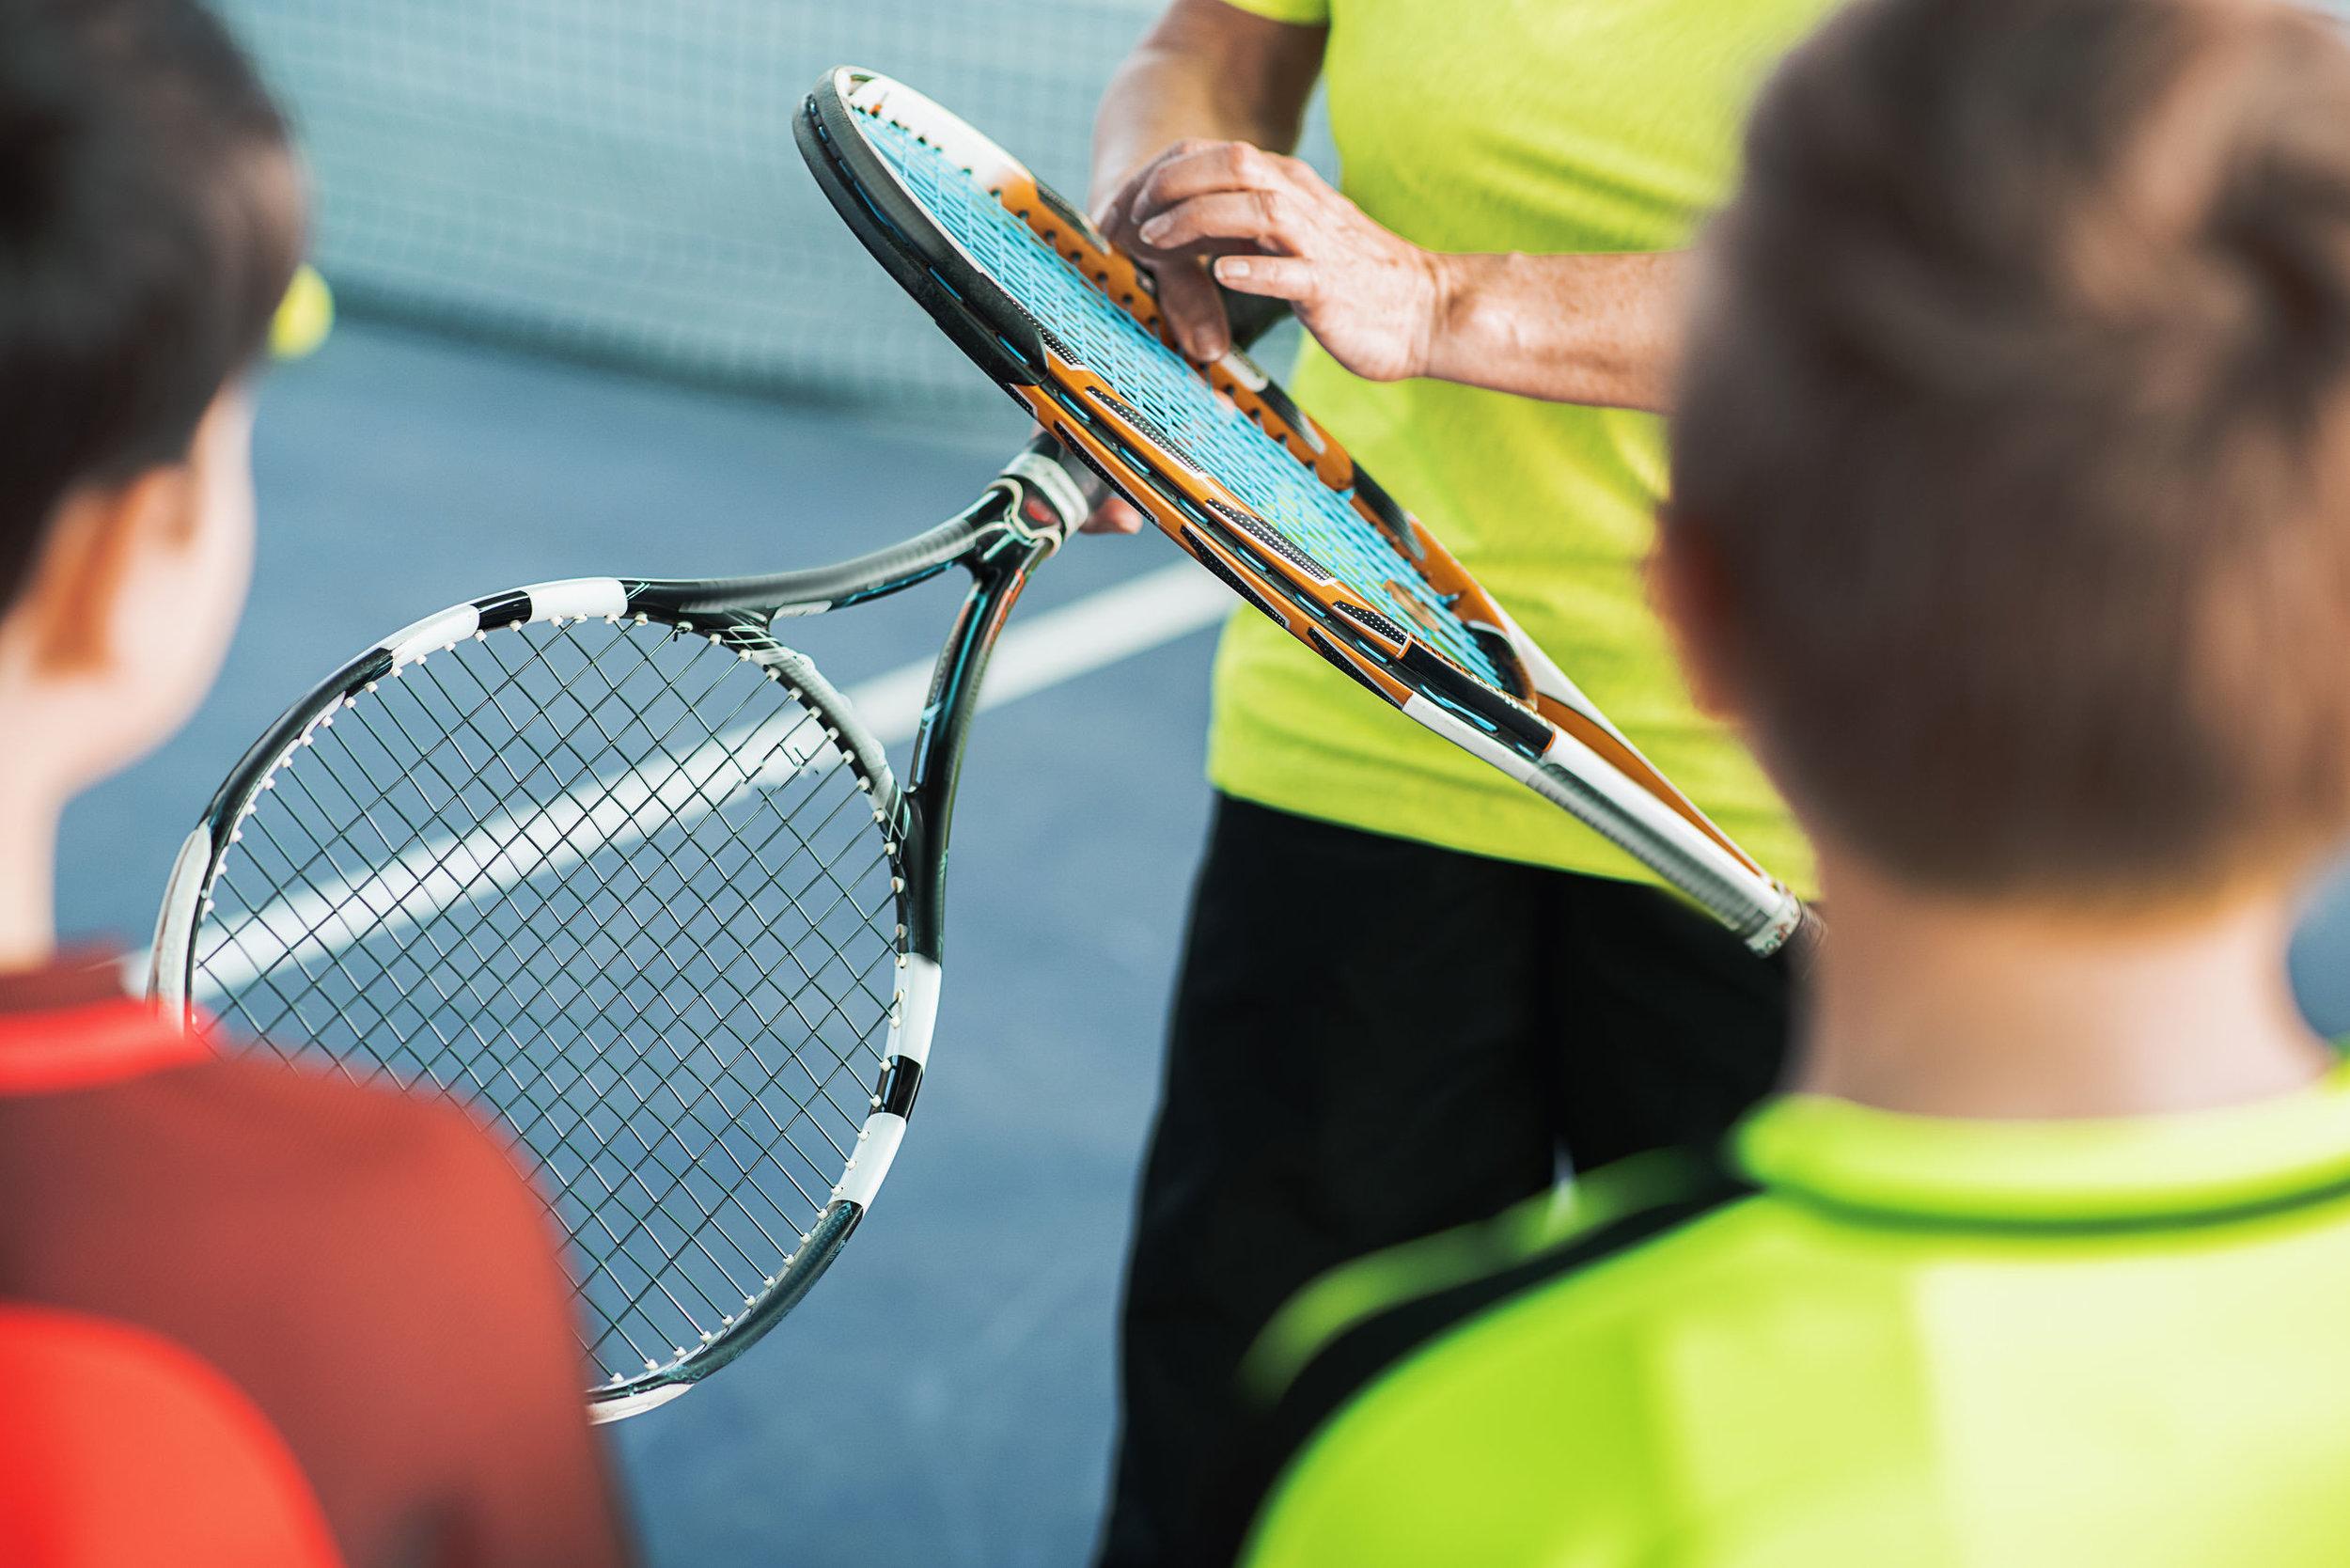 JUNIOR TENNIS - At Creekside Tennis & Swim Club